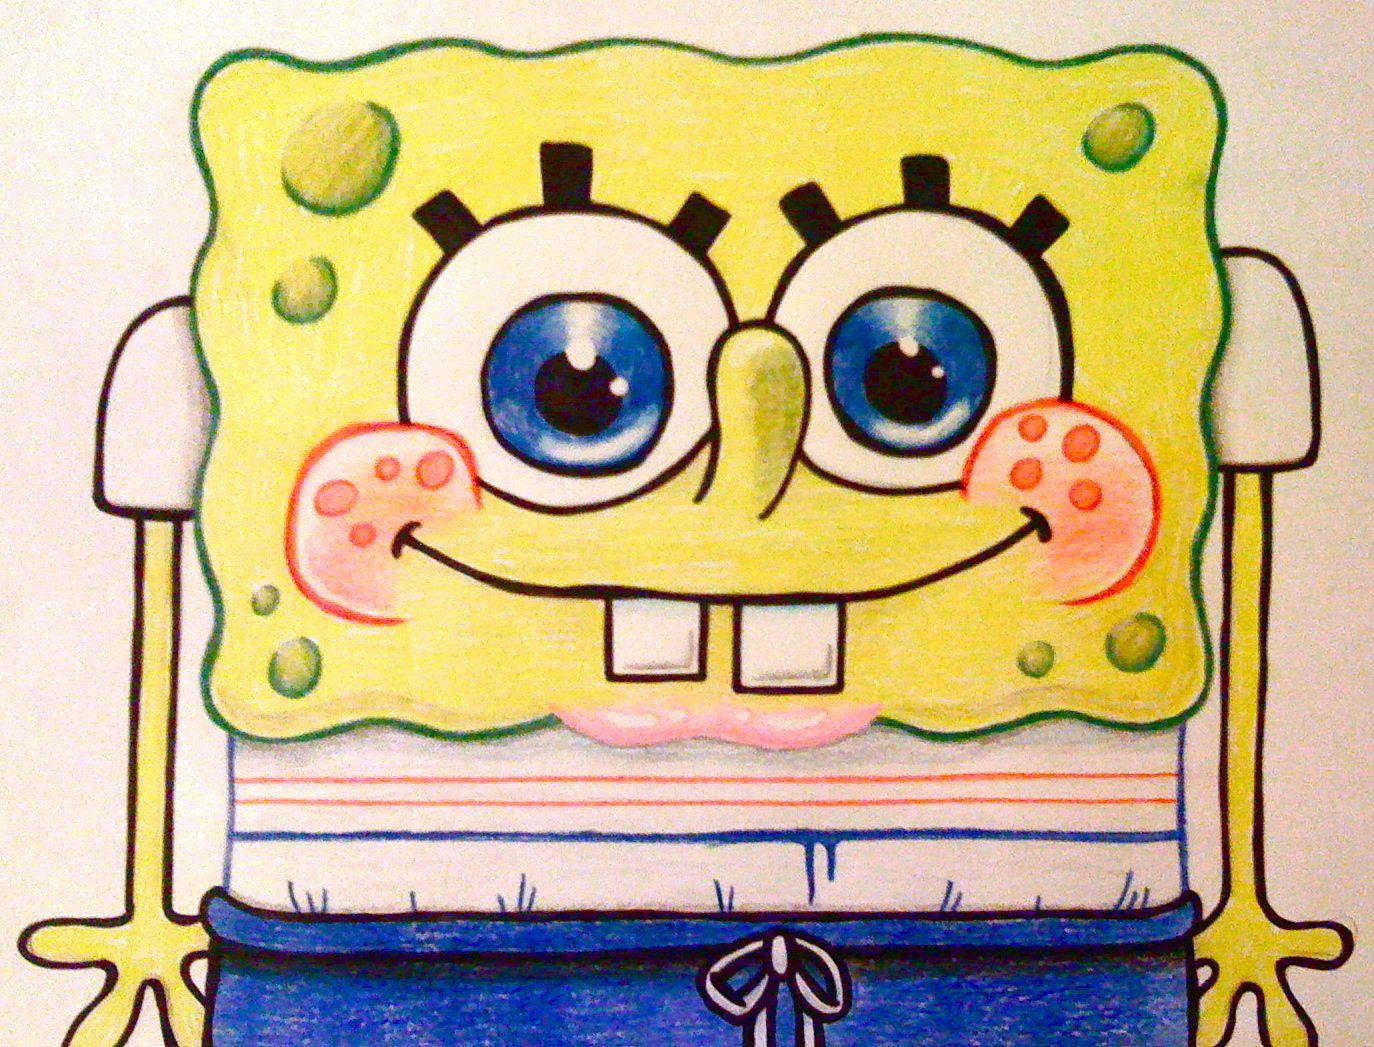 Cute Spongebob Baby Wallpaper 70829 Loadtve